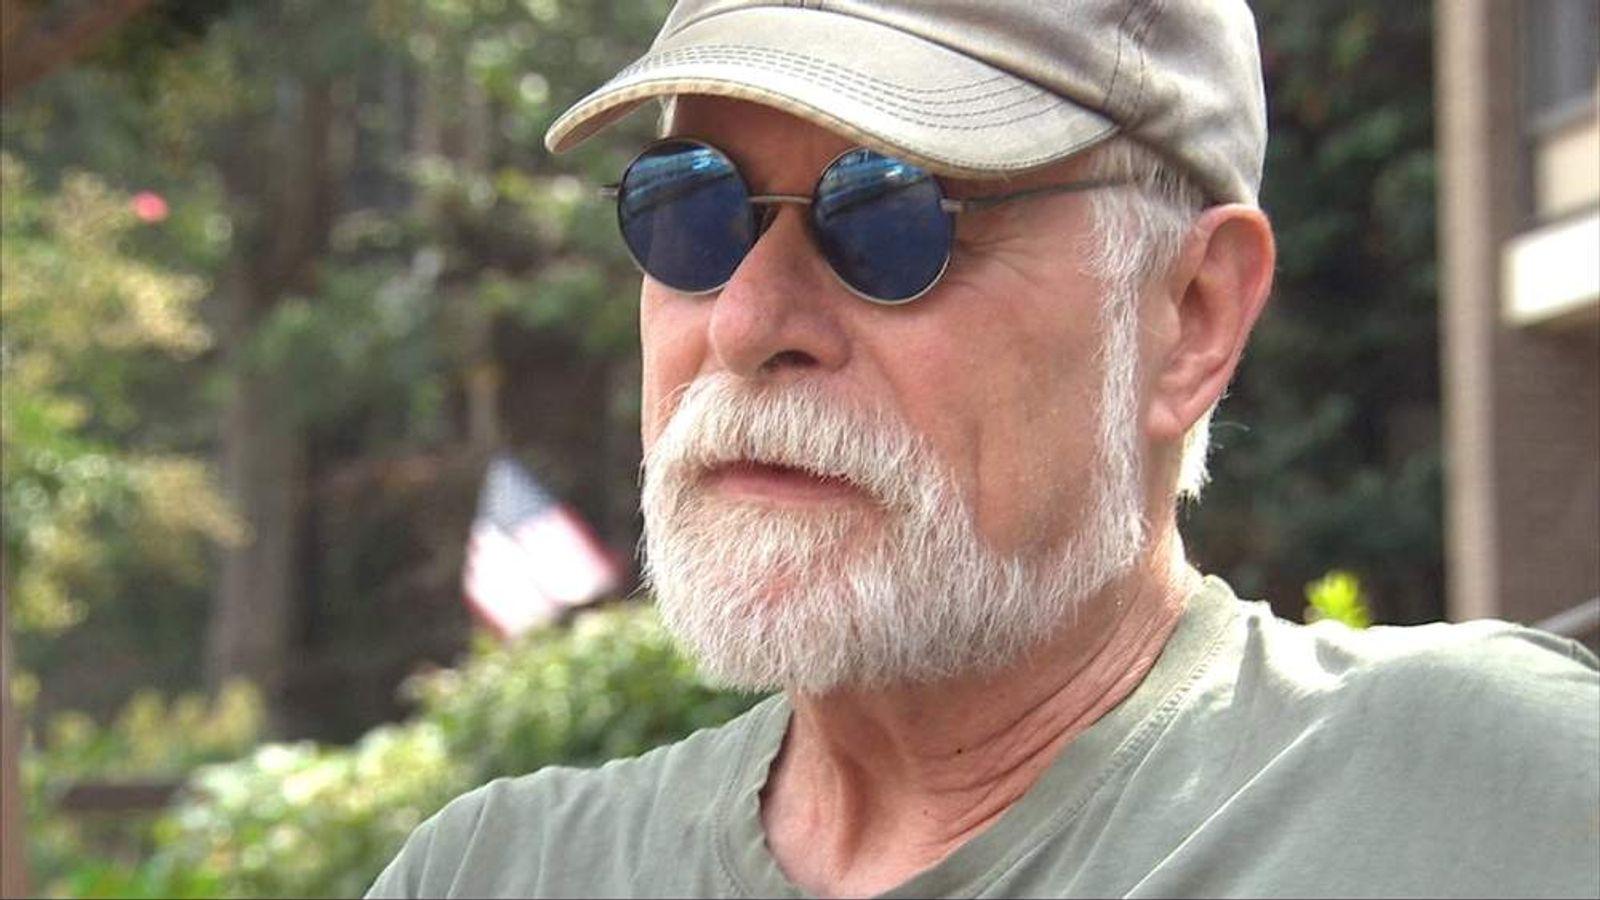 Vietnam War veteran John Piper